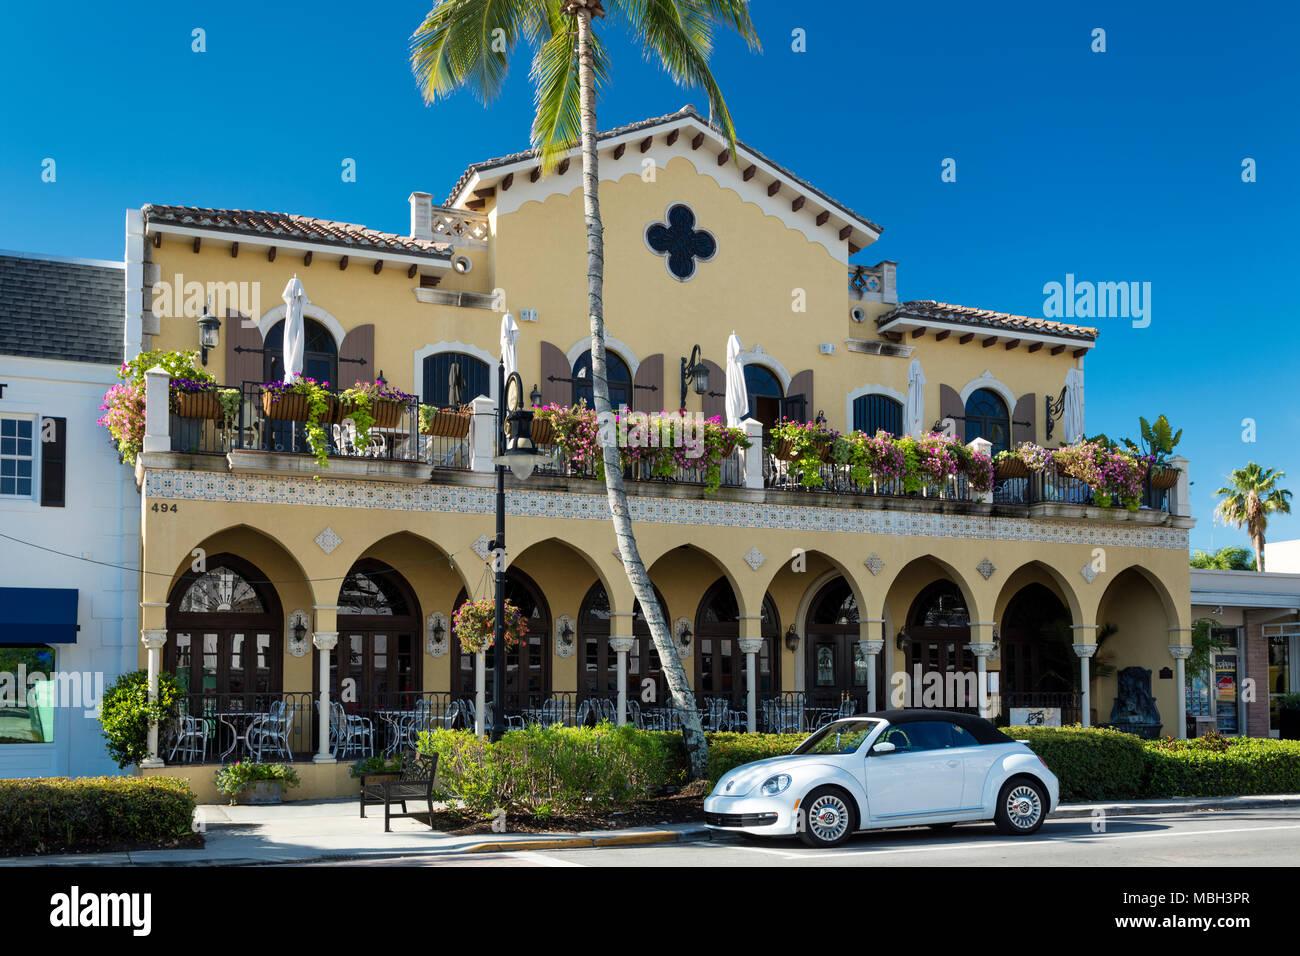 Cafe Lurcat - Fine Dining Restaurant 5th Avenue entlang, Naples, Florida, USA Stockbild